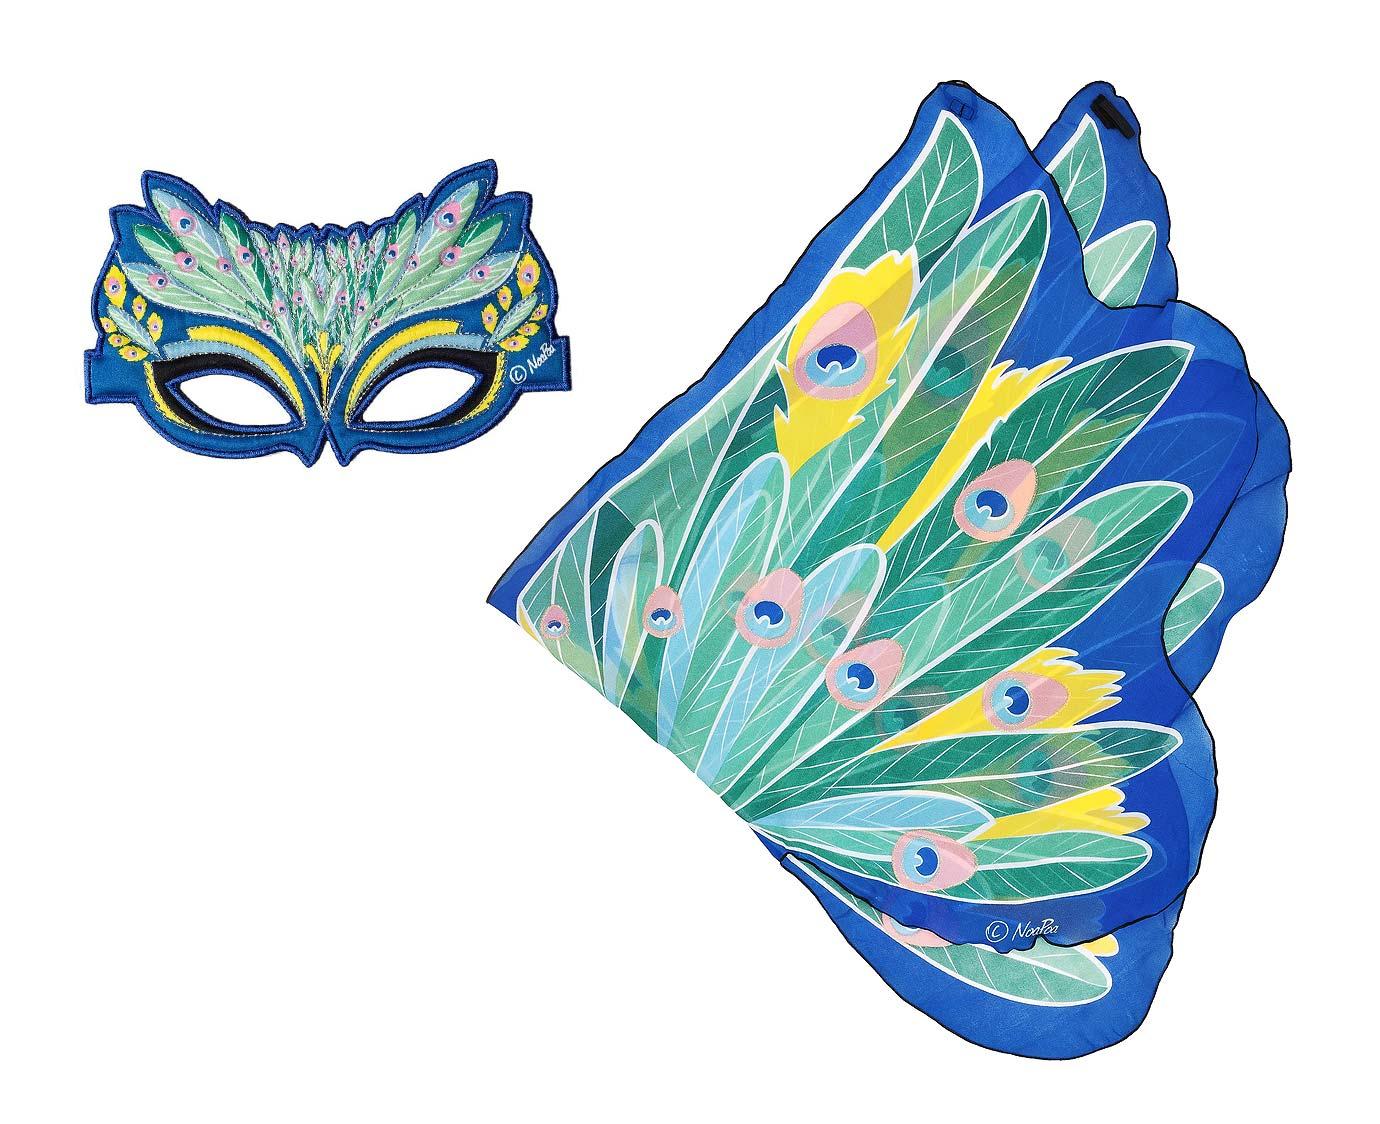 Vleugel set 'Peacock'